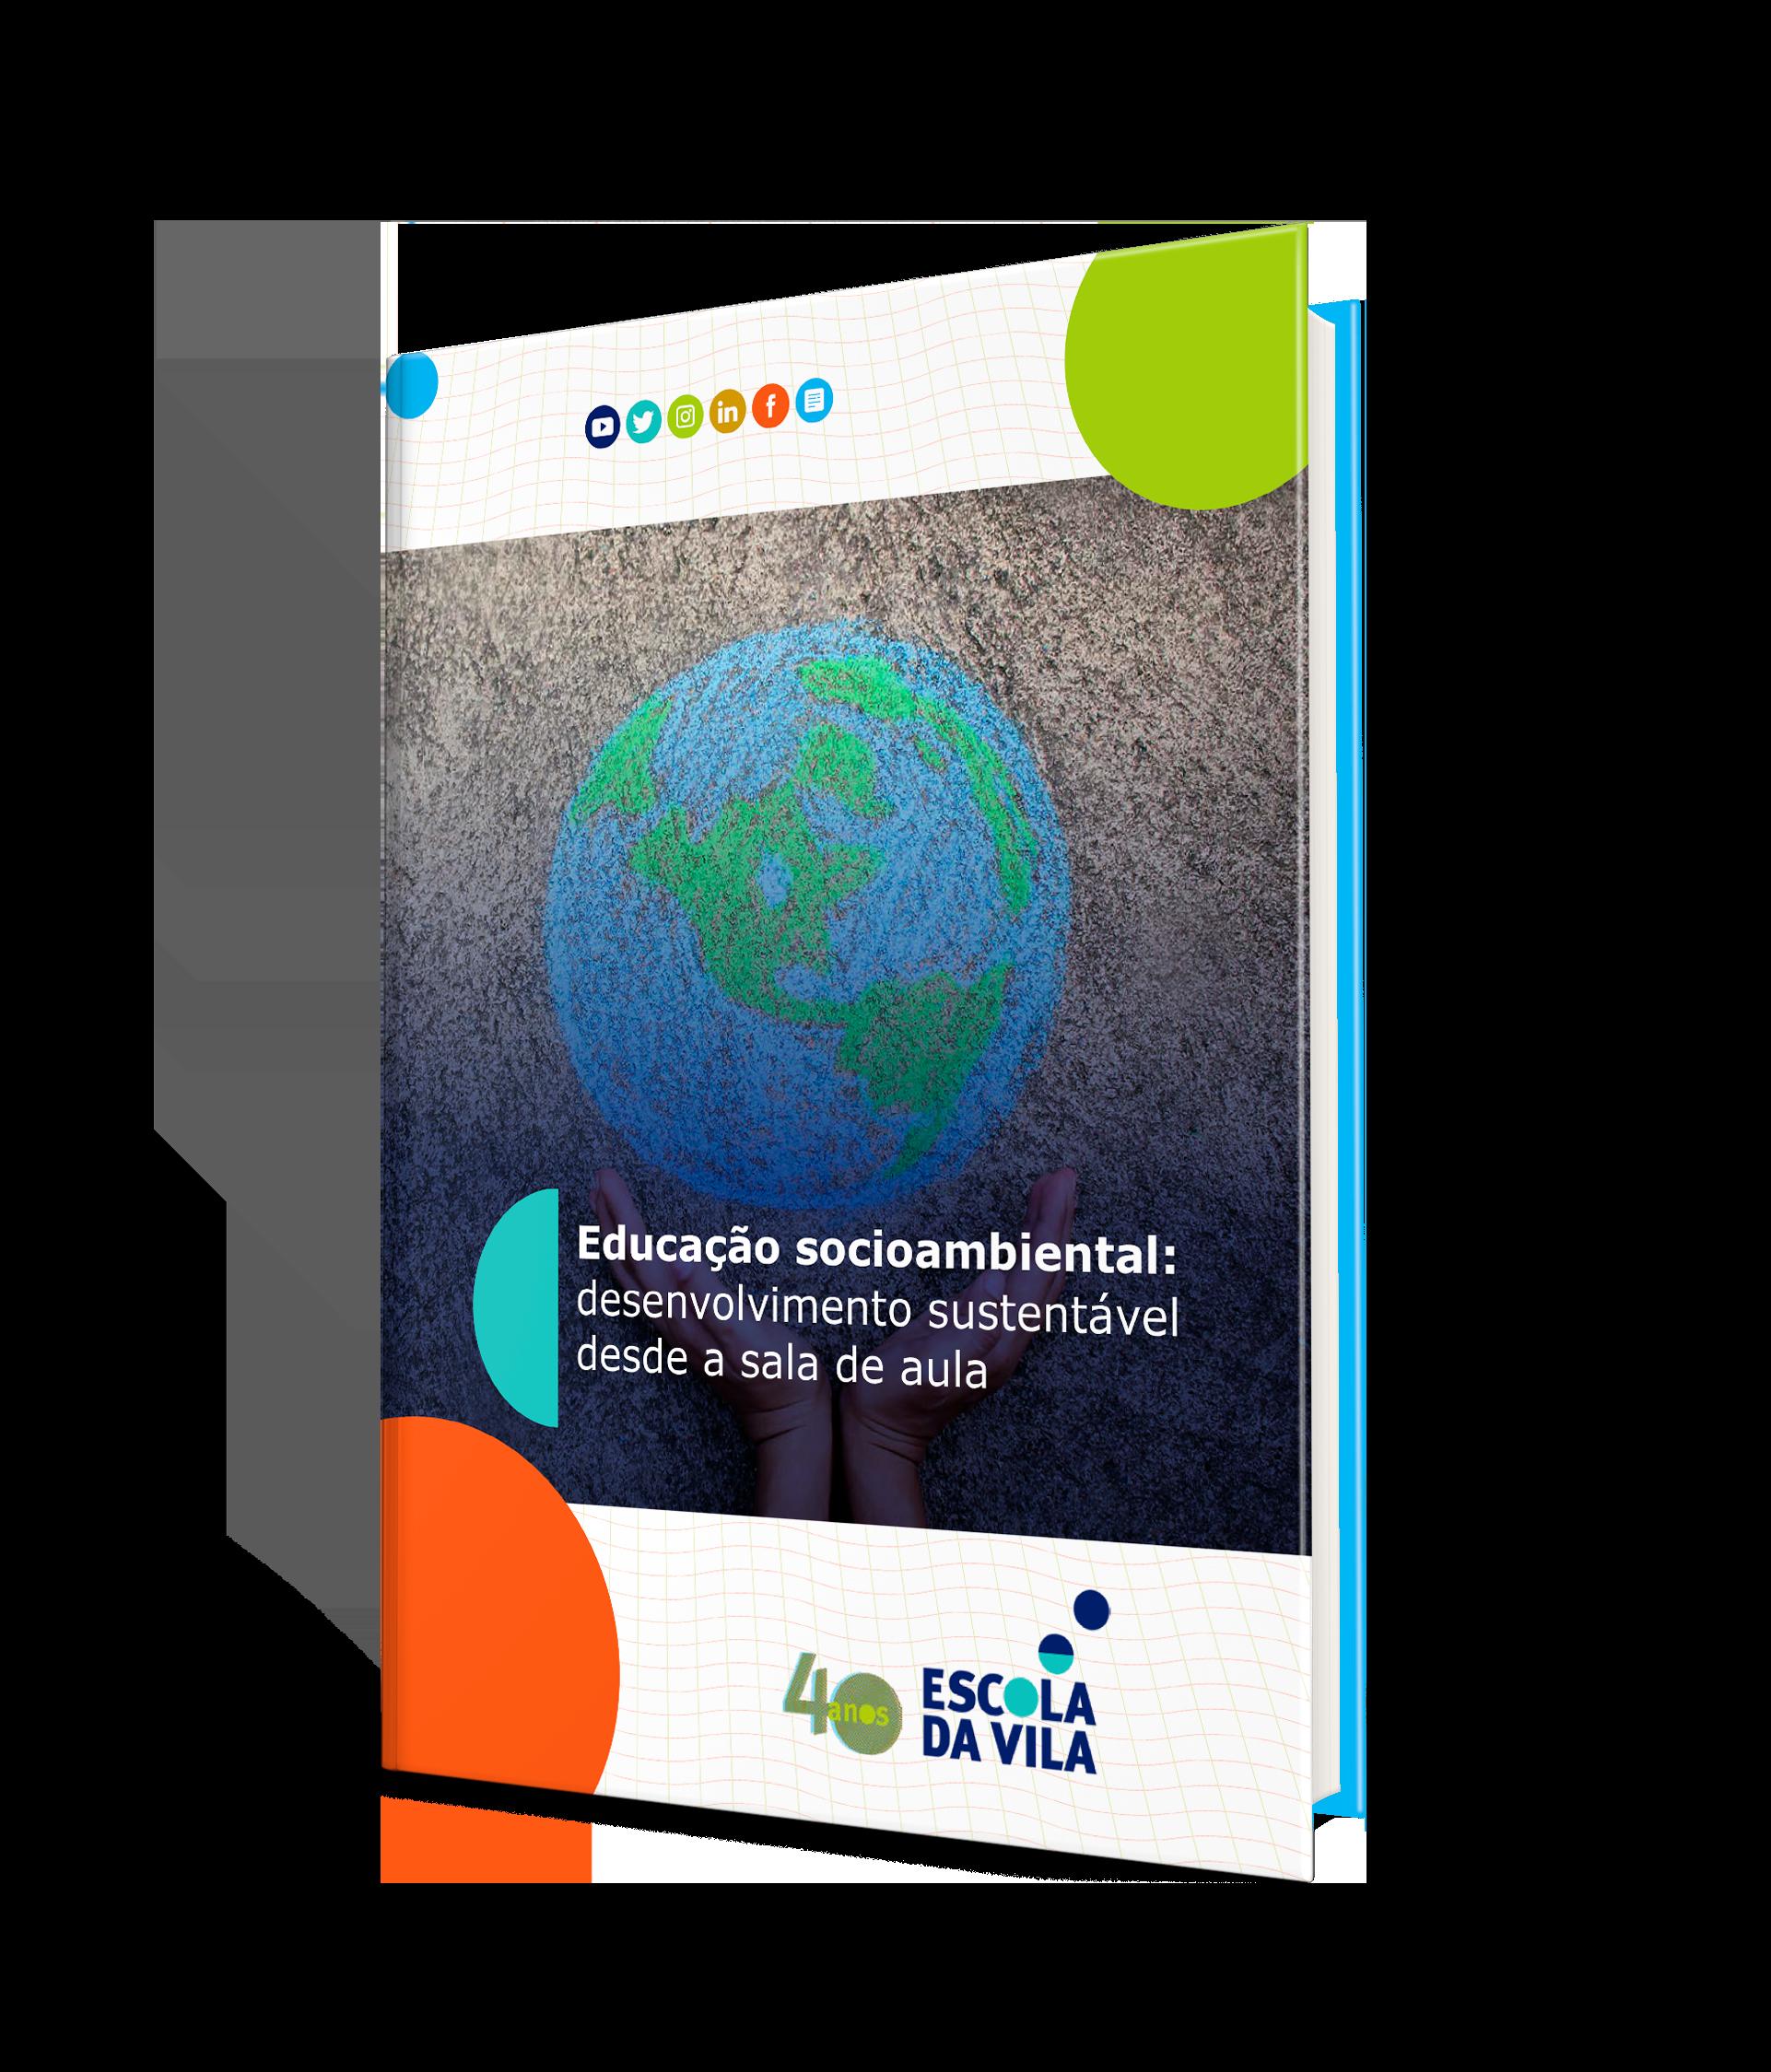 Mockup_Educação socioambiental_educacao-socioambiental-desenvolvimento-desde-a-sala-de-aula